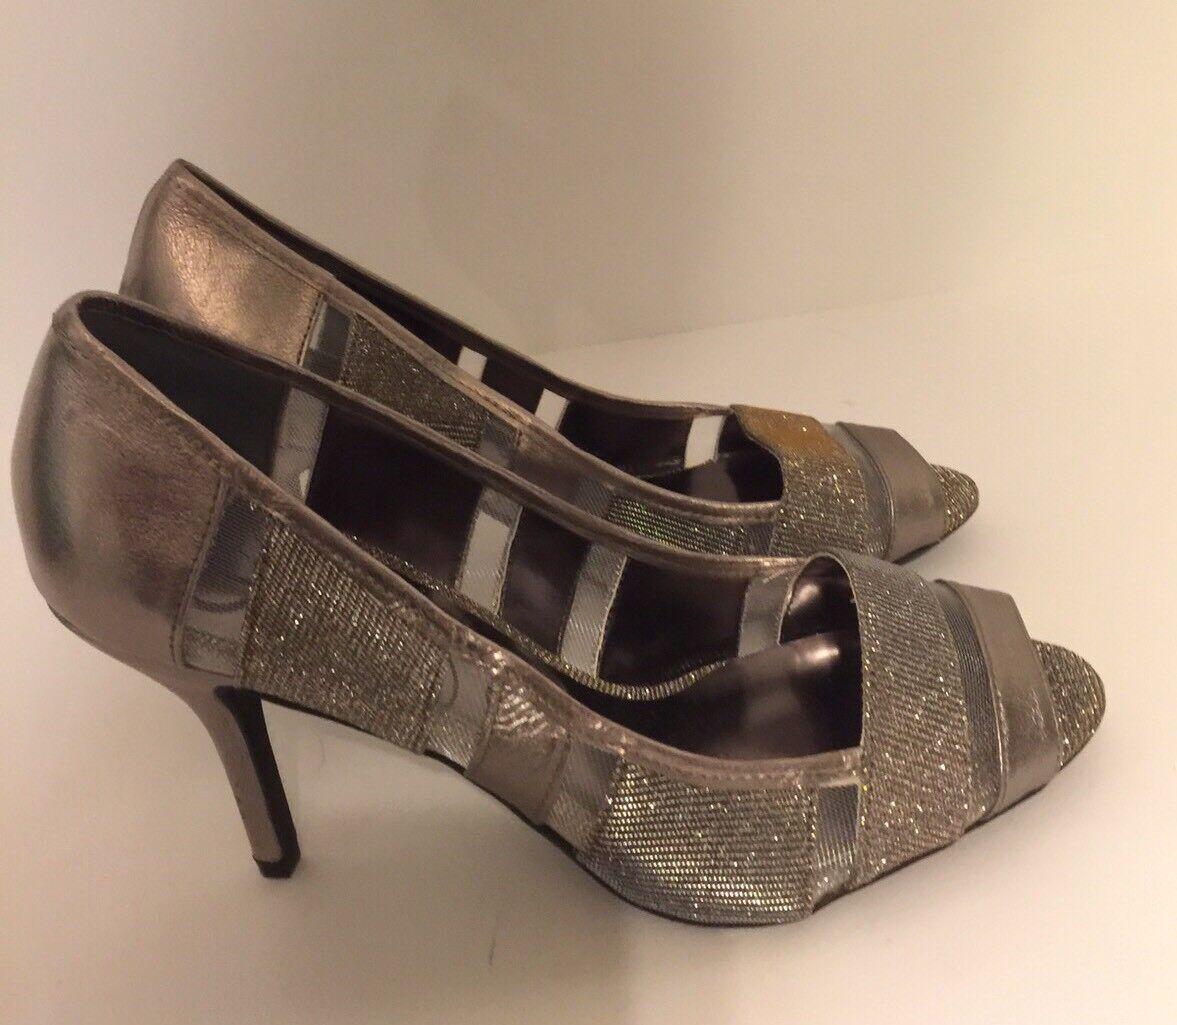 Adrianna Papell Flair Metallic Mesh & Satin Crystal-Embellished Peep Toe Pump 8